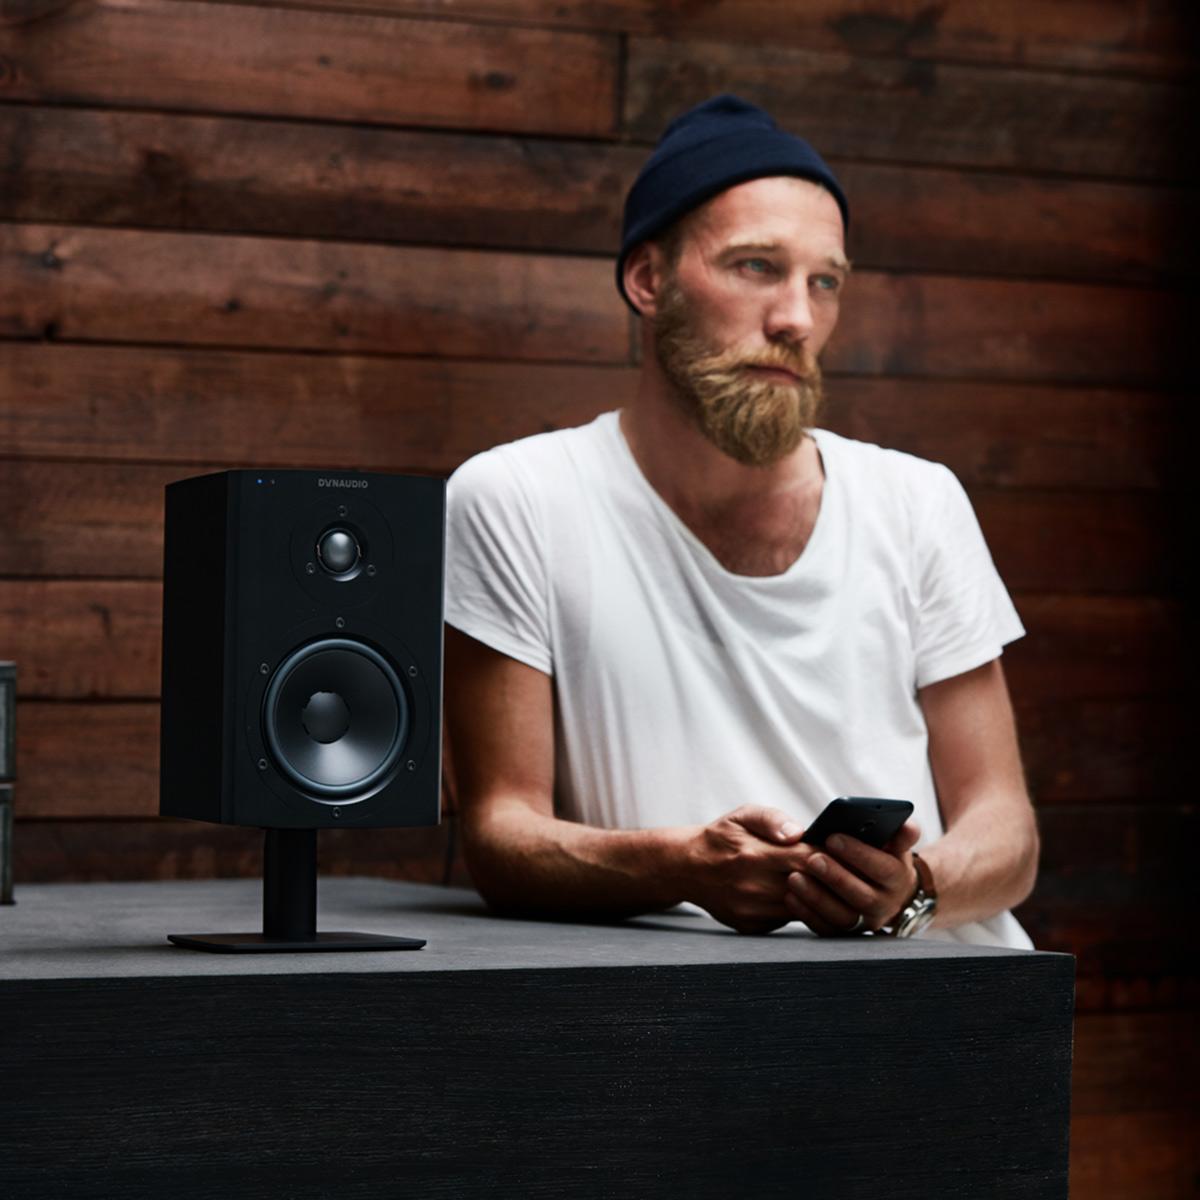 Dynaudio-Xeo-2-Wireless-Bookshelf-Speakers-Pair thumbnail 22